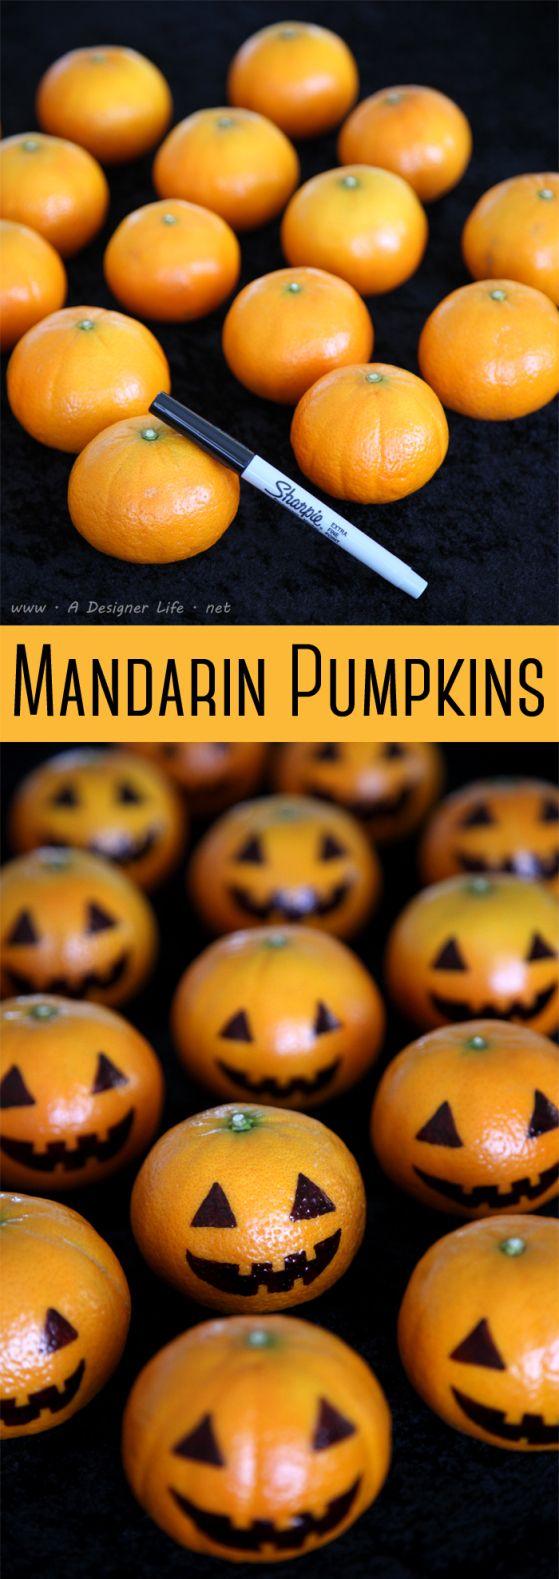 Food Design 5 Easy Halloween Food Ideas kid party ideas - cute homemade halloween decorations